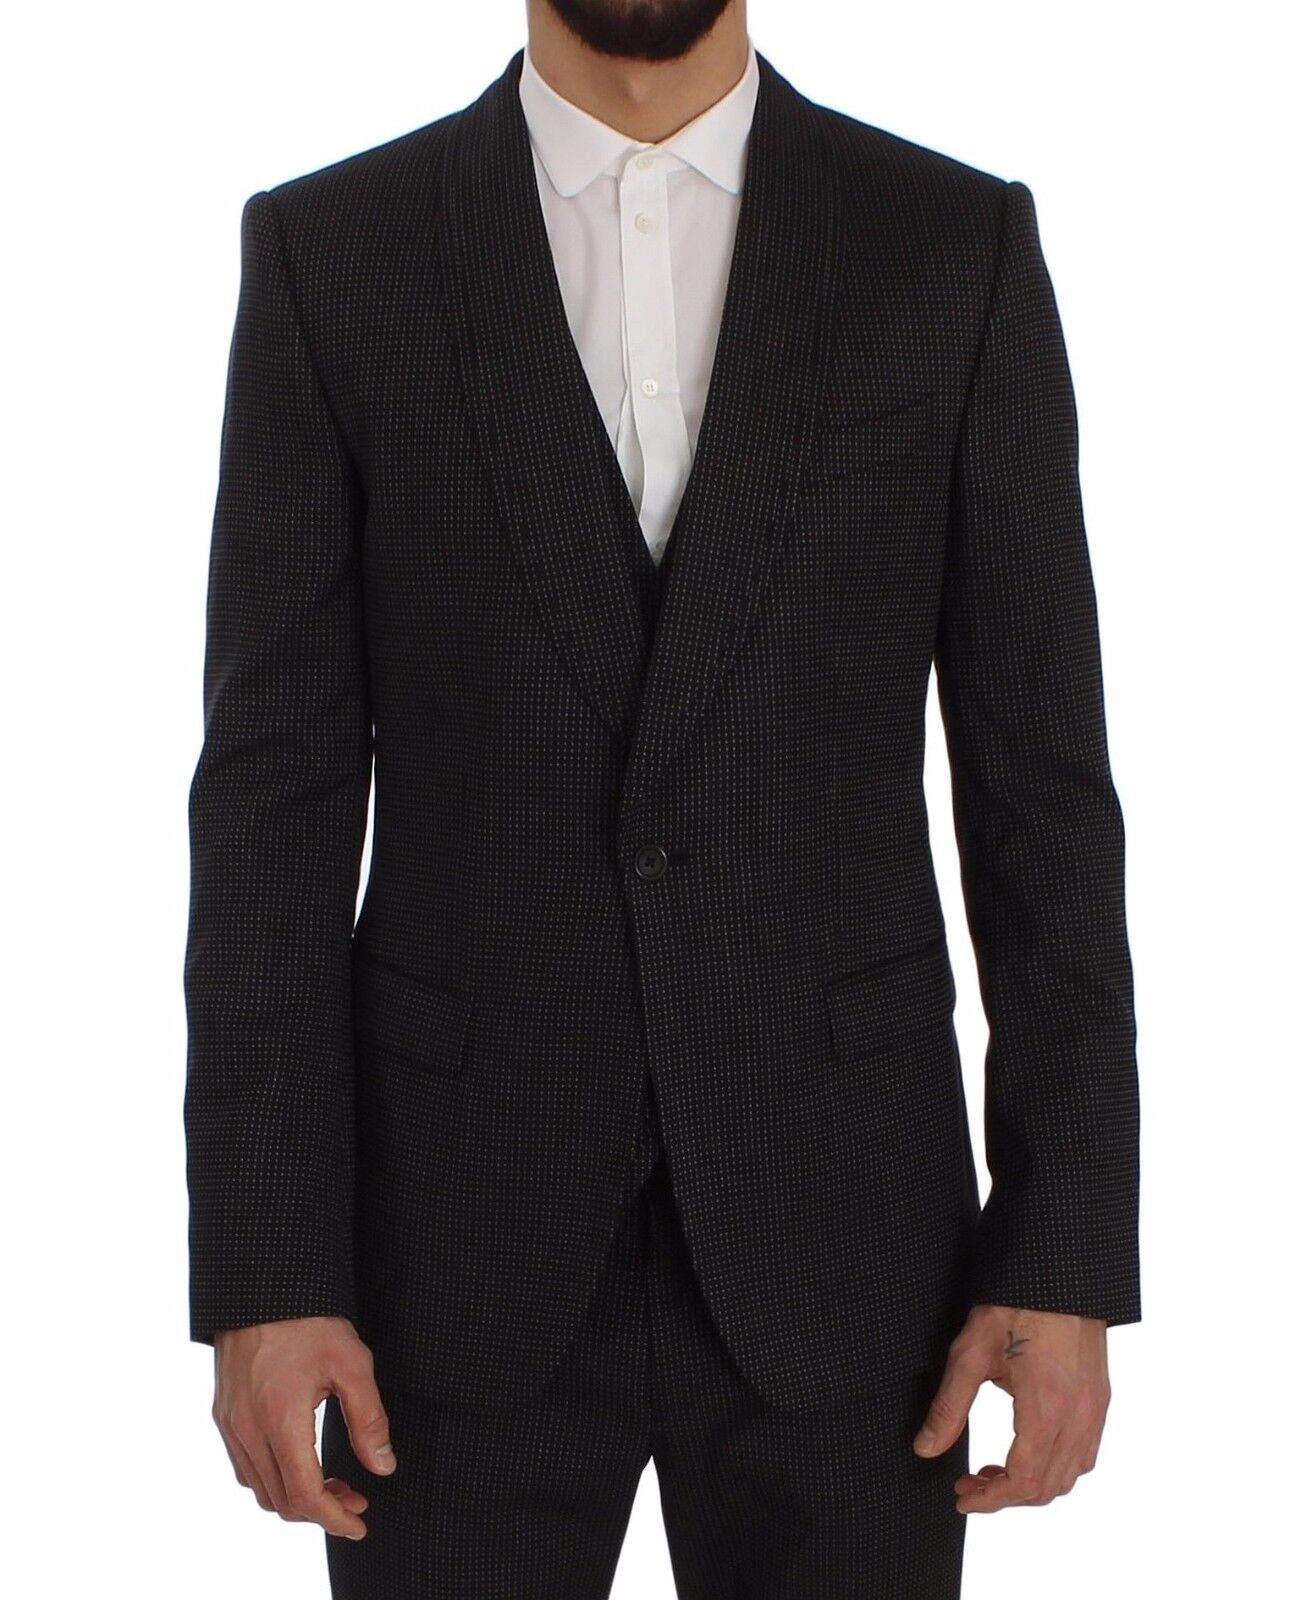 NEW DOLCE & GABBANA Suit 3 Piece grau Wool Silk Stretch Slim Fit EU52/US42